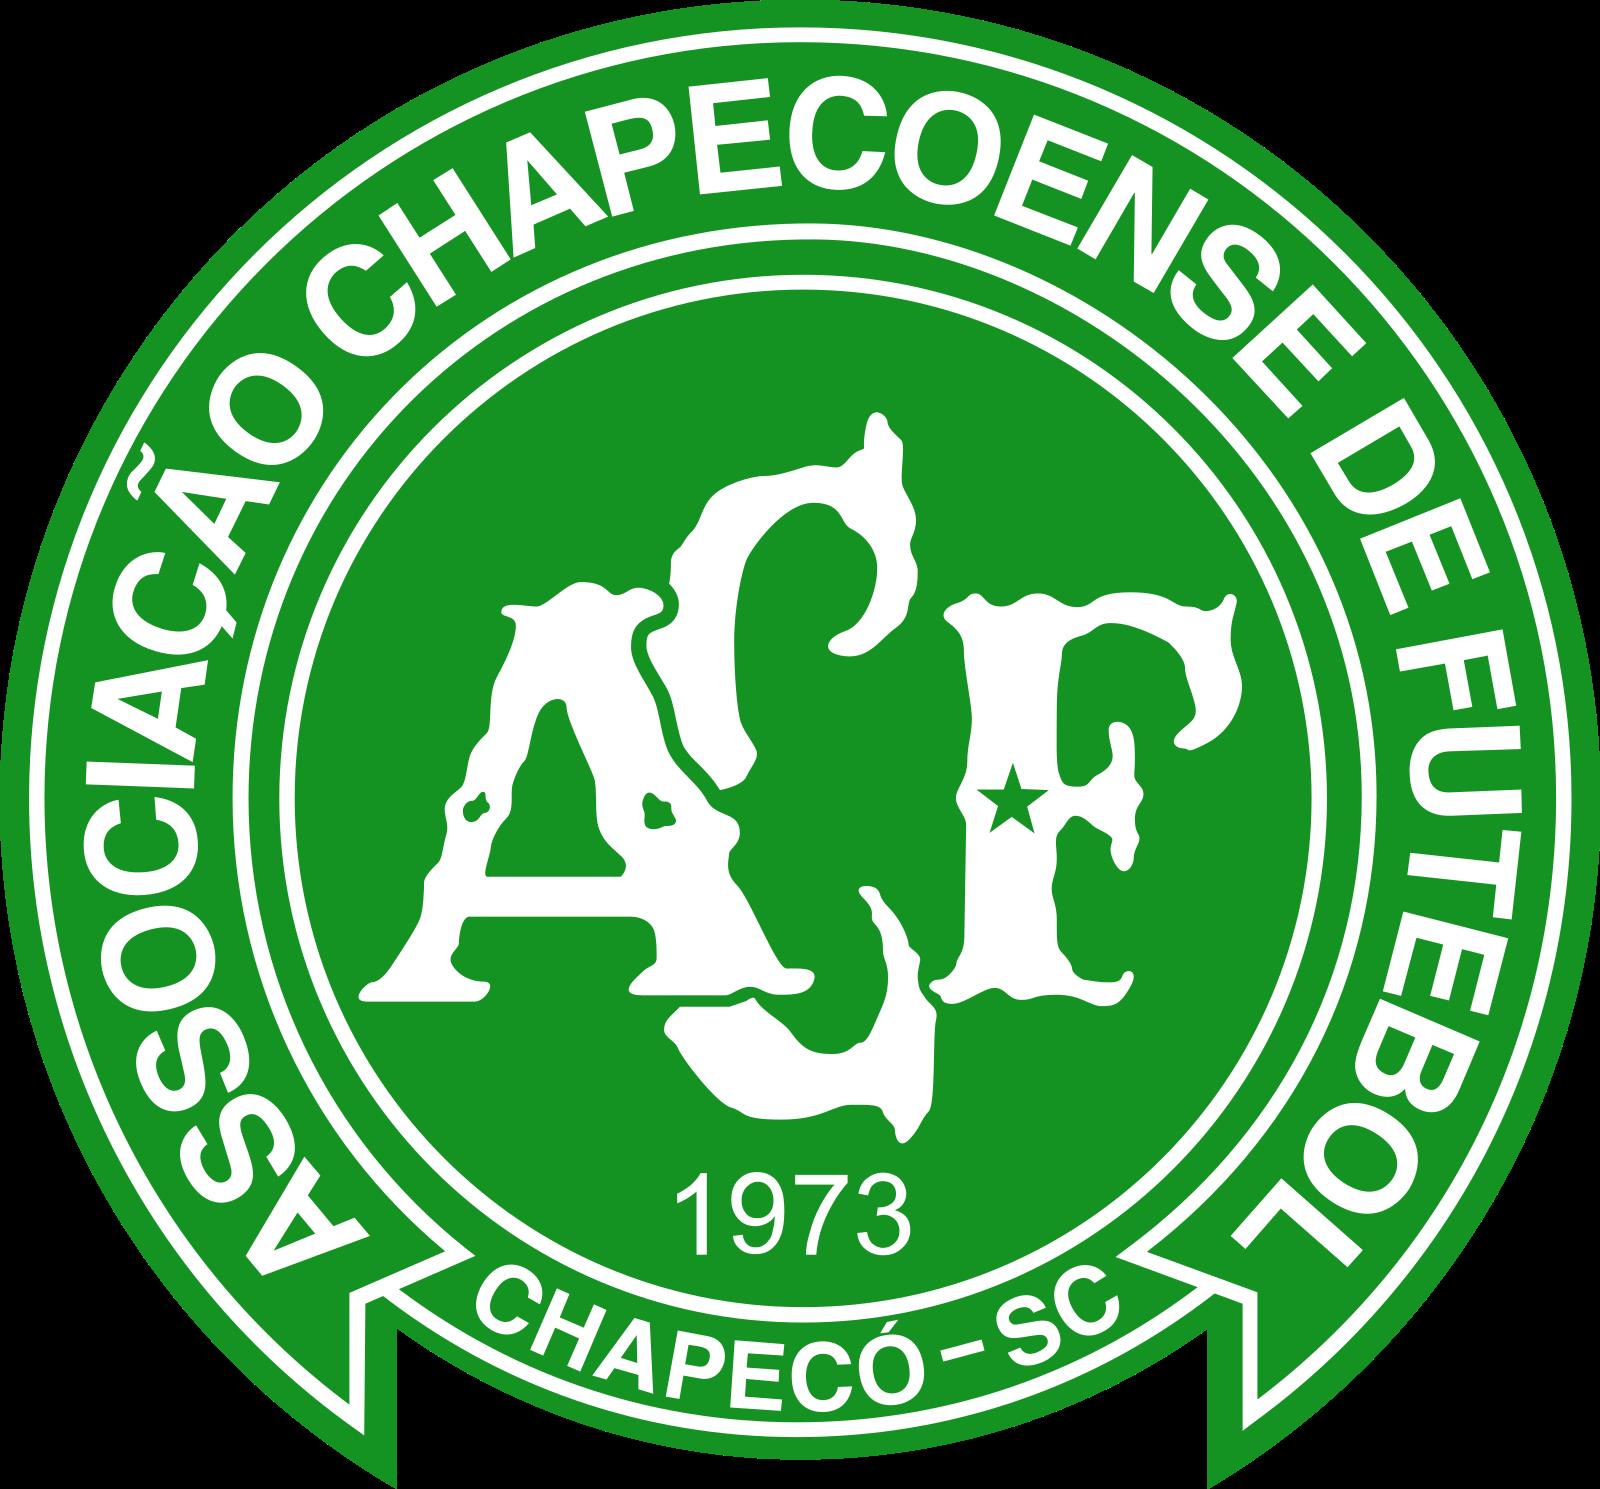 Chapecoense Logo. Escudo, Shield.